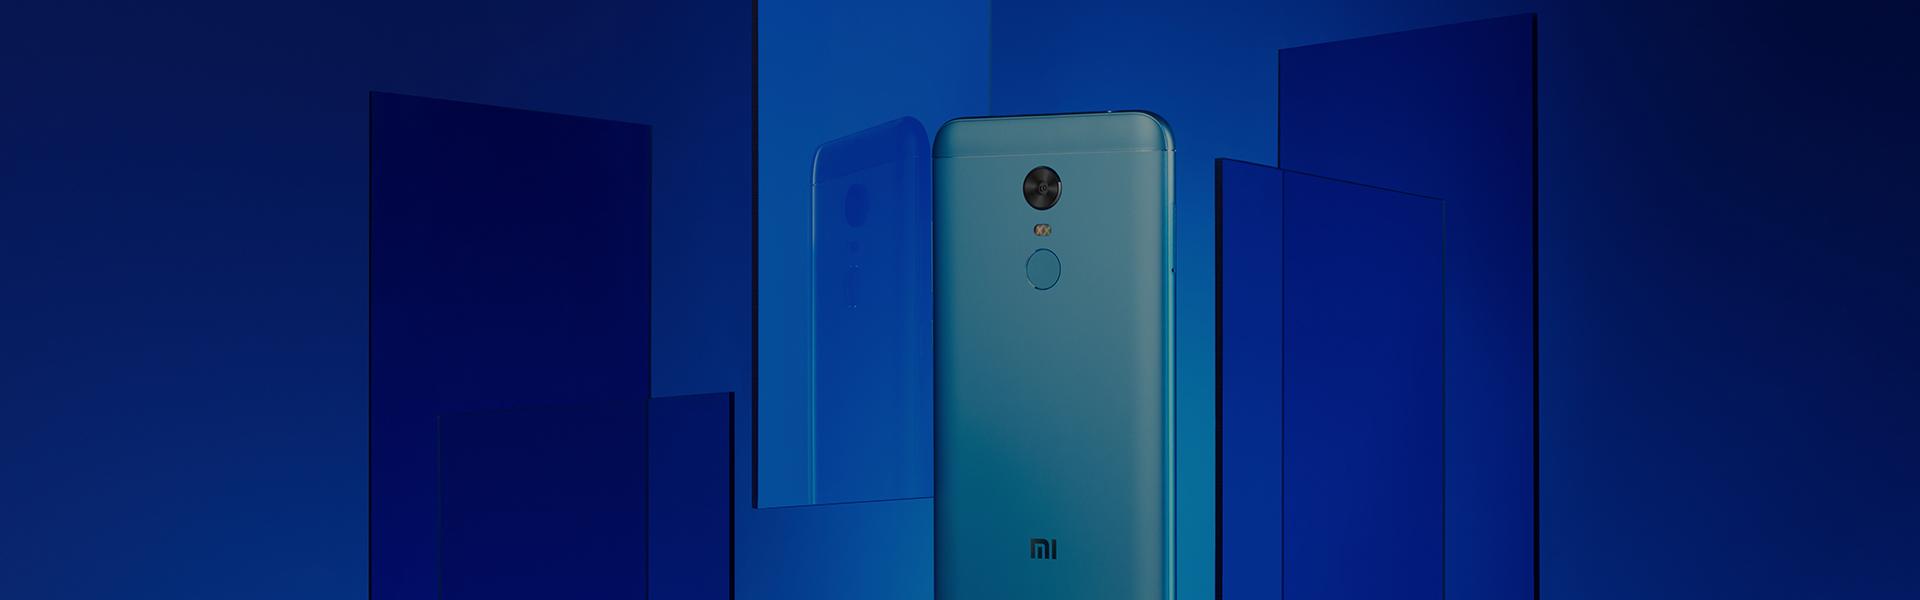 RECENSIONE Xiaomi Redmi 5 Plus - BEST BUY 2018!